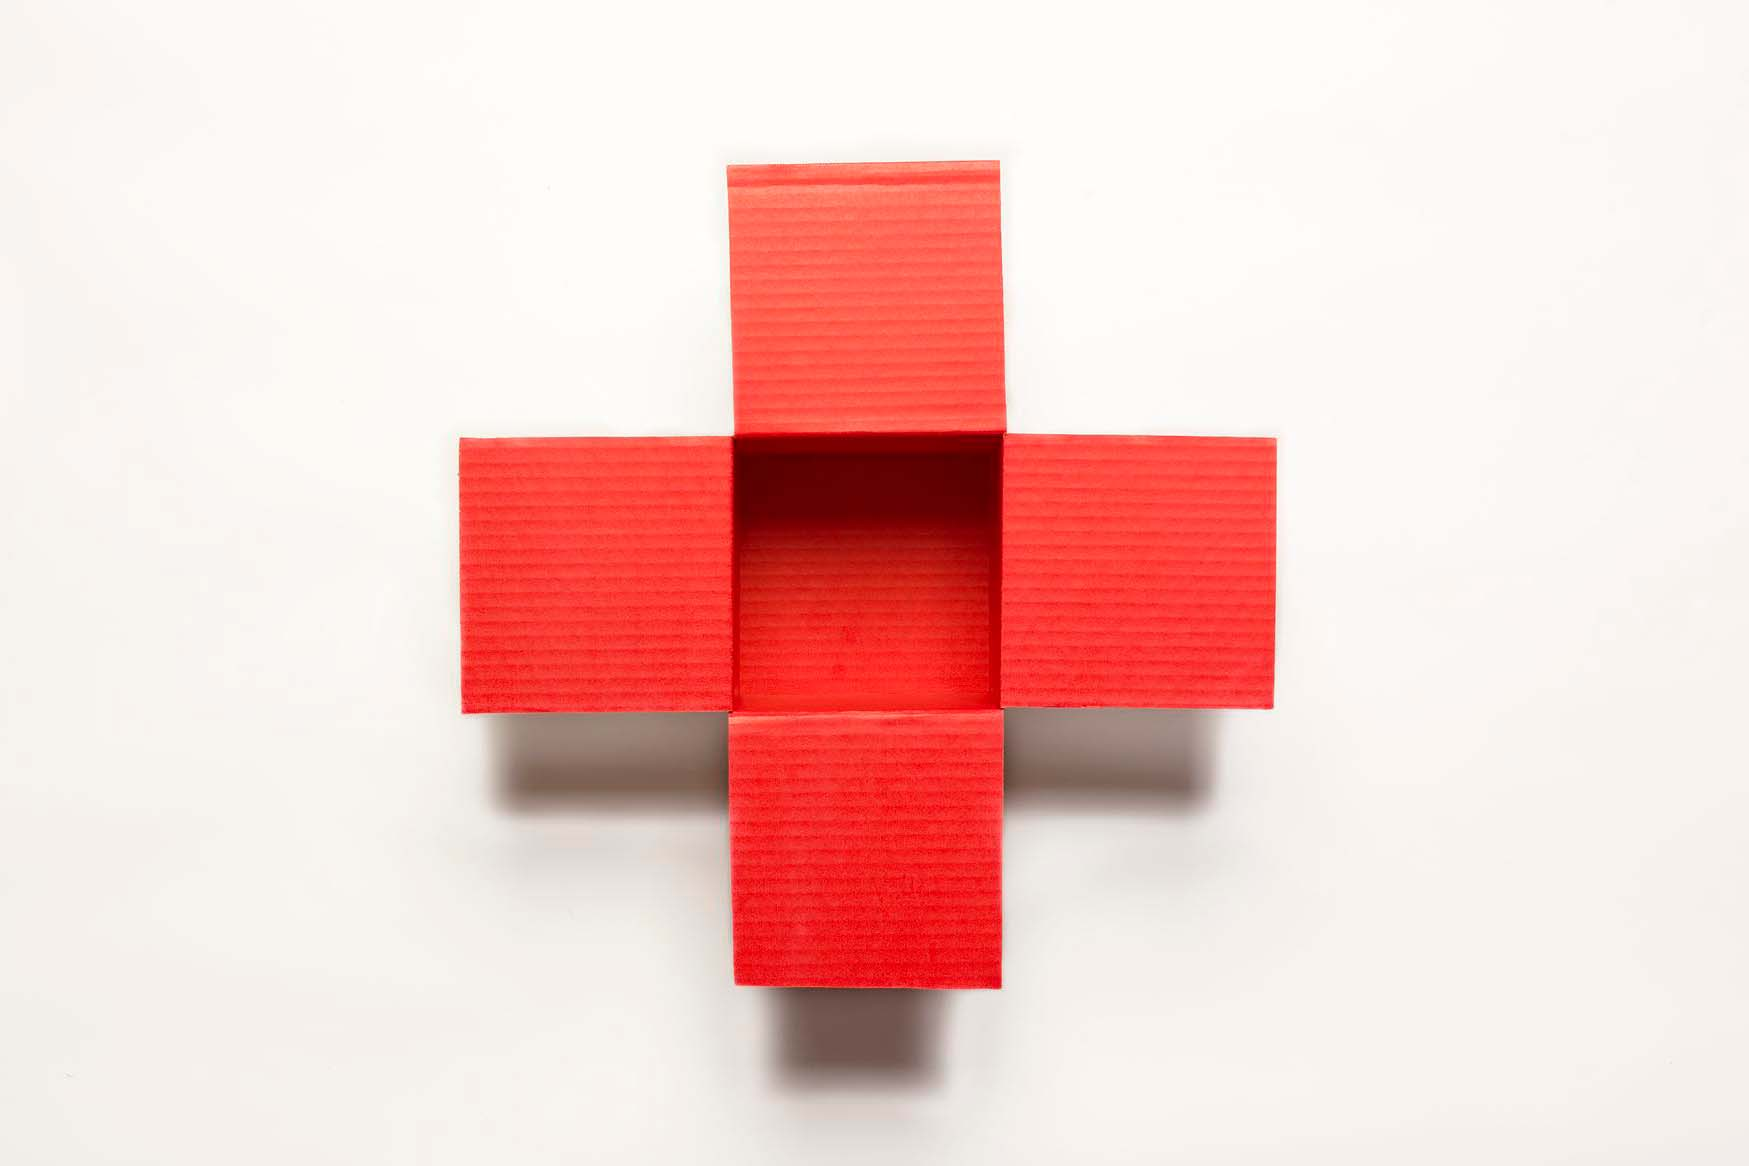 Care lab red cross